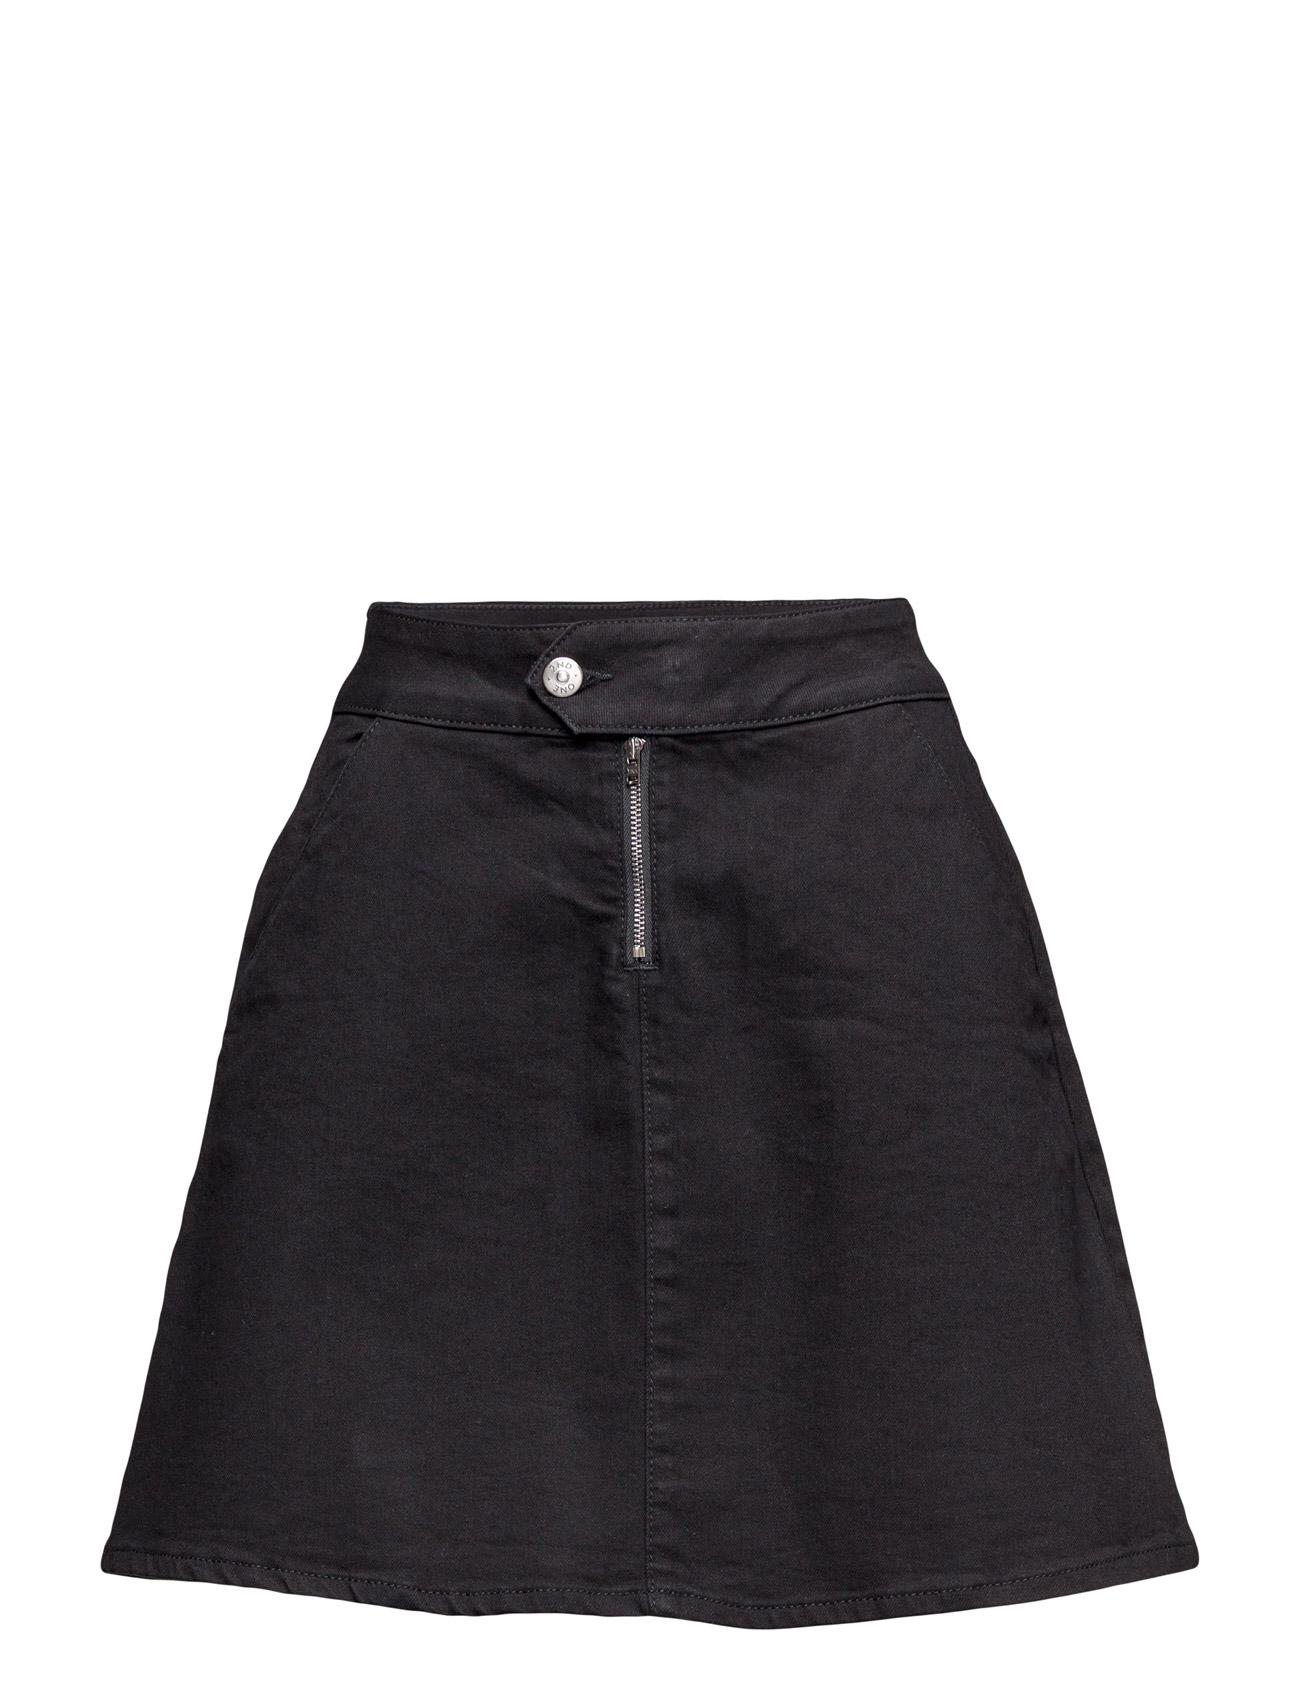 2nd one Jessie 842 black, skirt på boozt.com dk